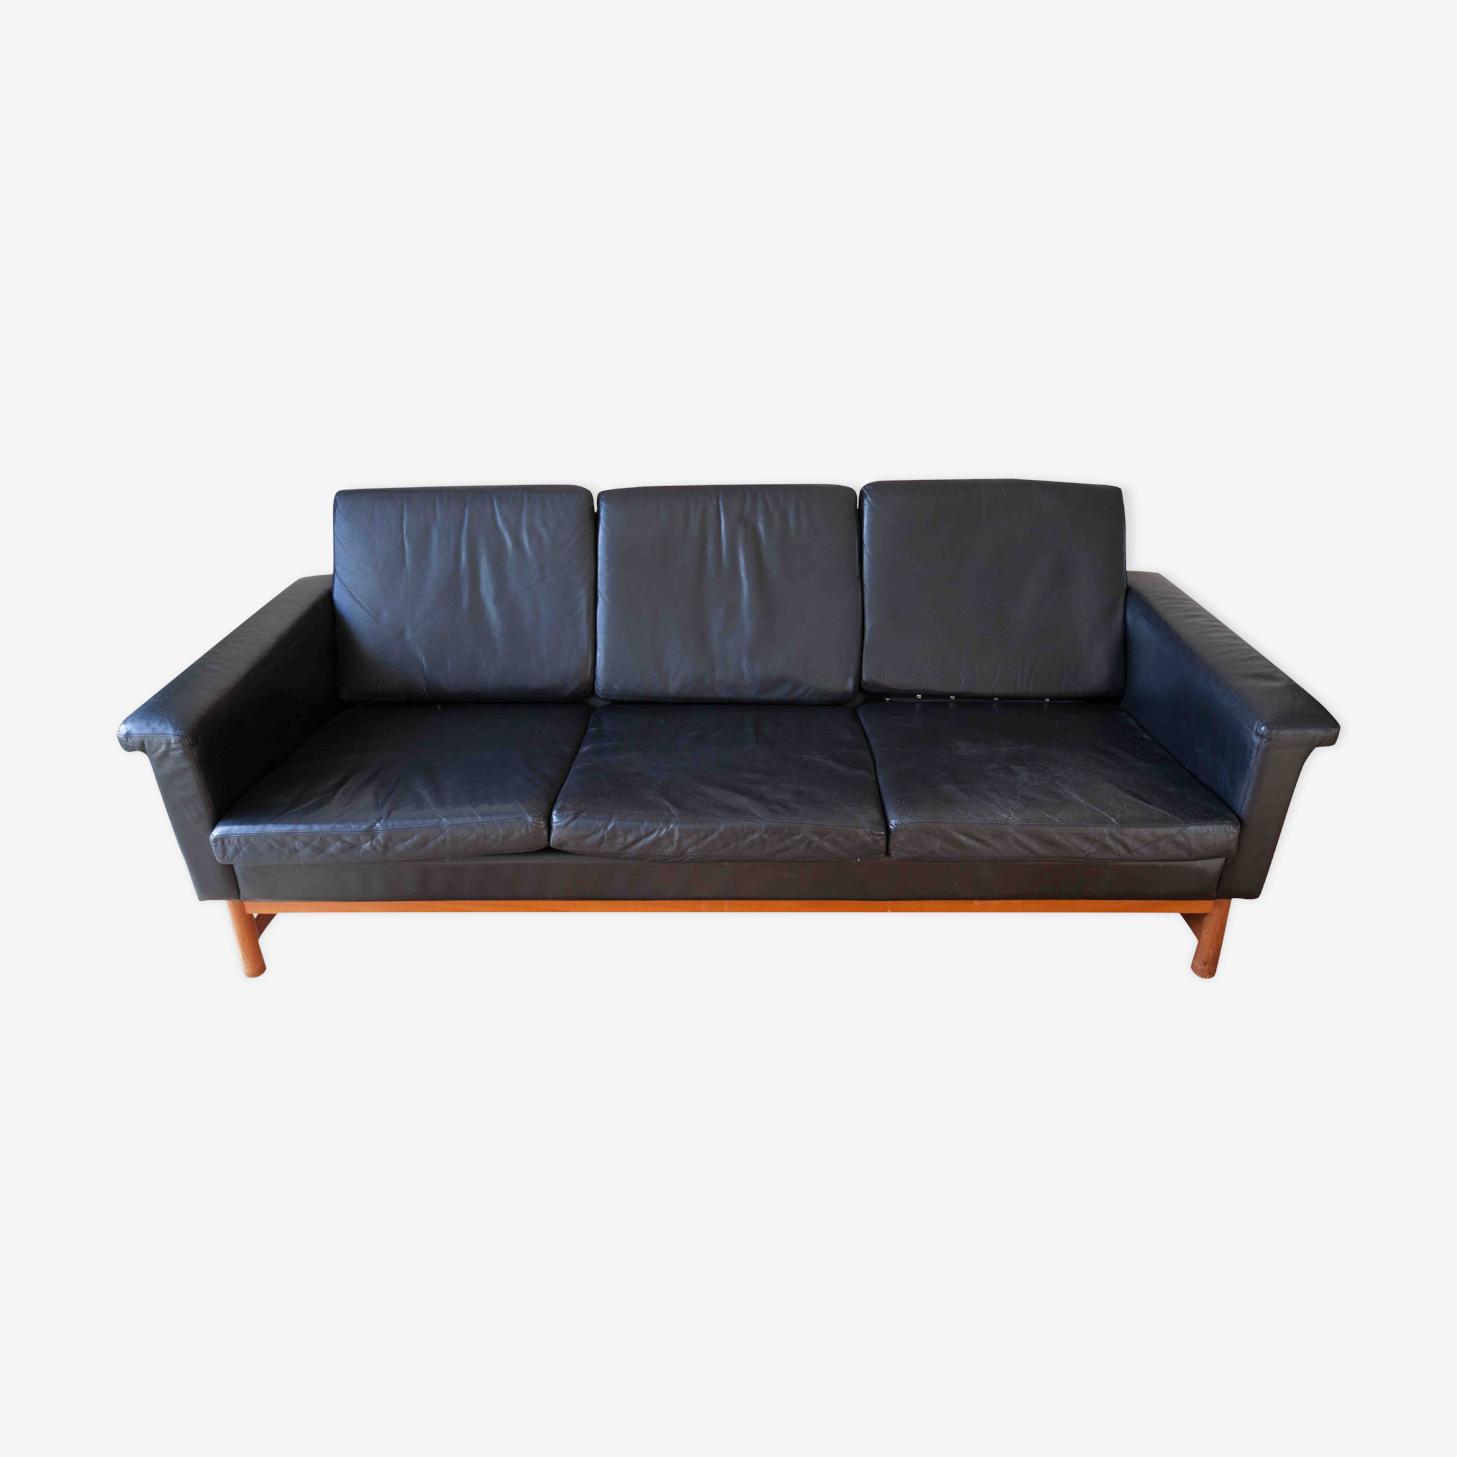 Canapé scandinave cuir / teck design vintage